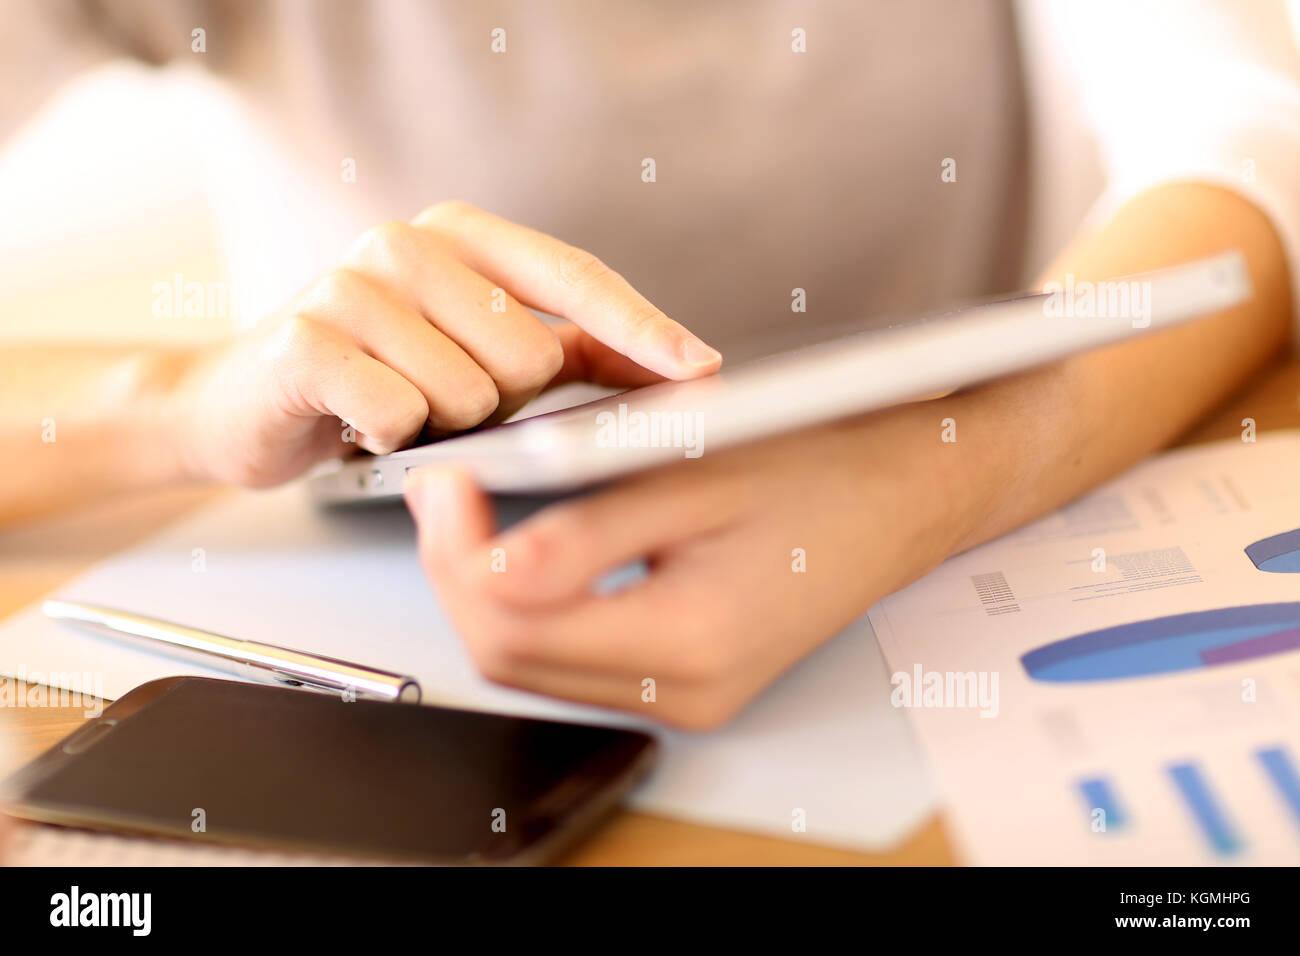 People using digital tablet Photo Stock